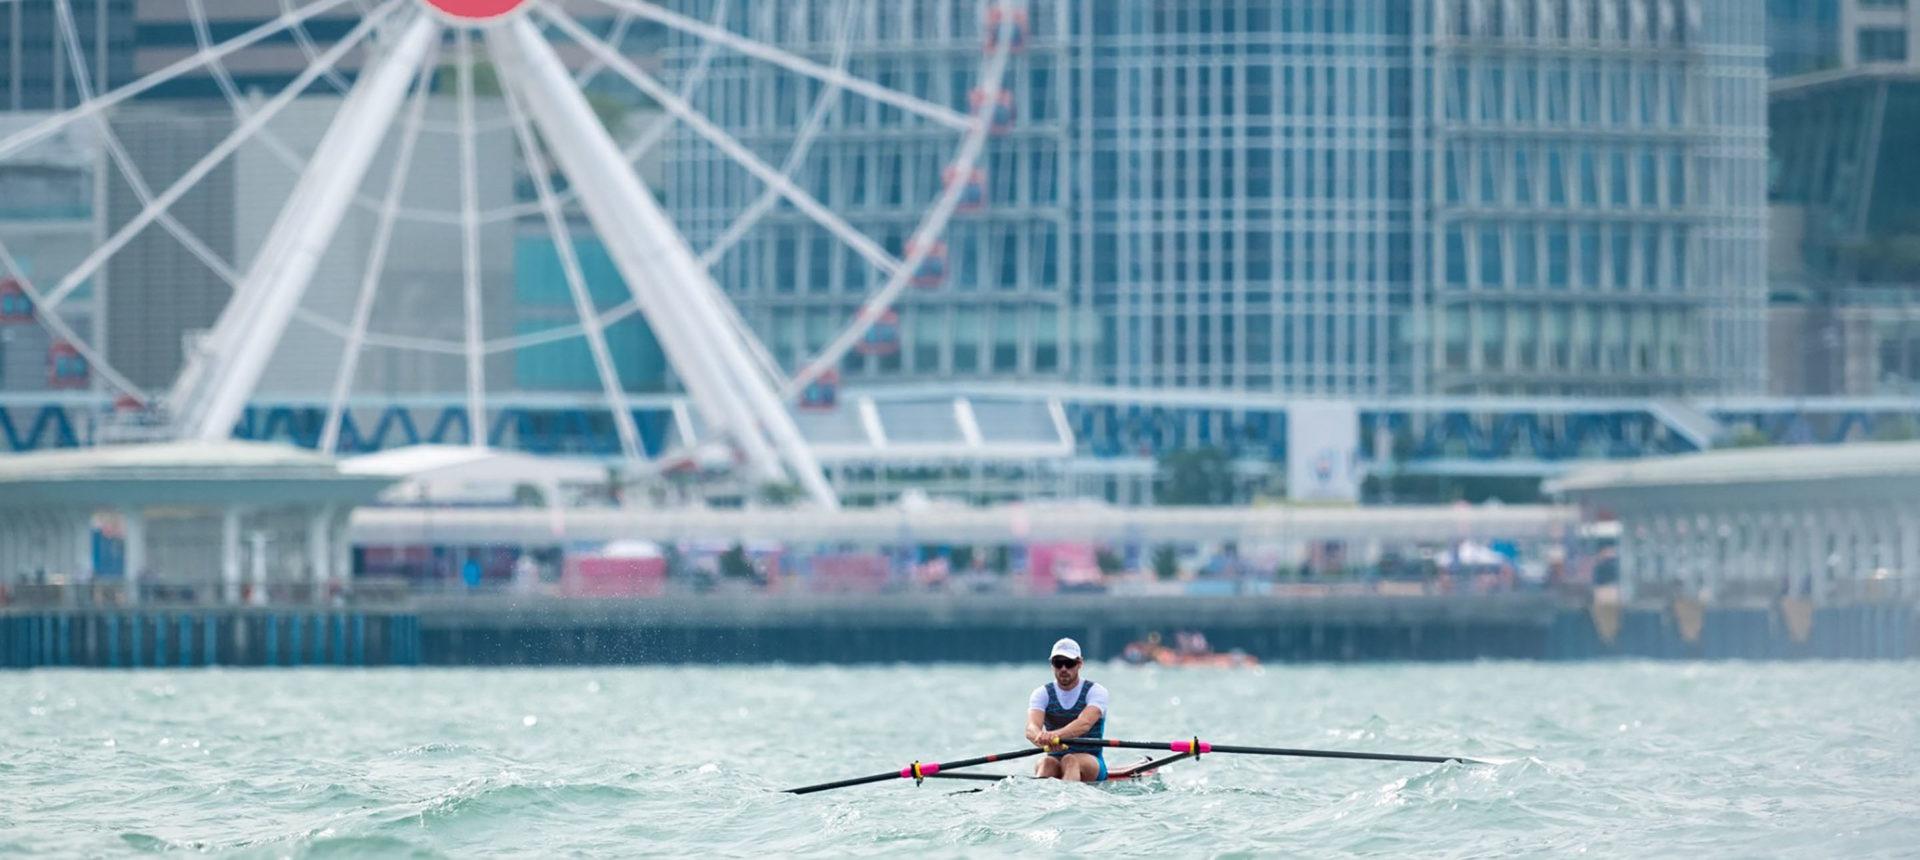 Canadians set to make waves in Hong Kong